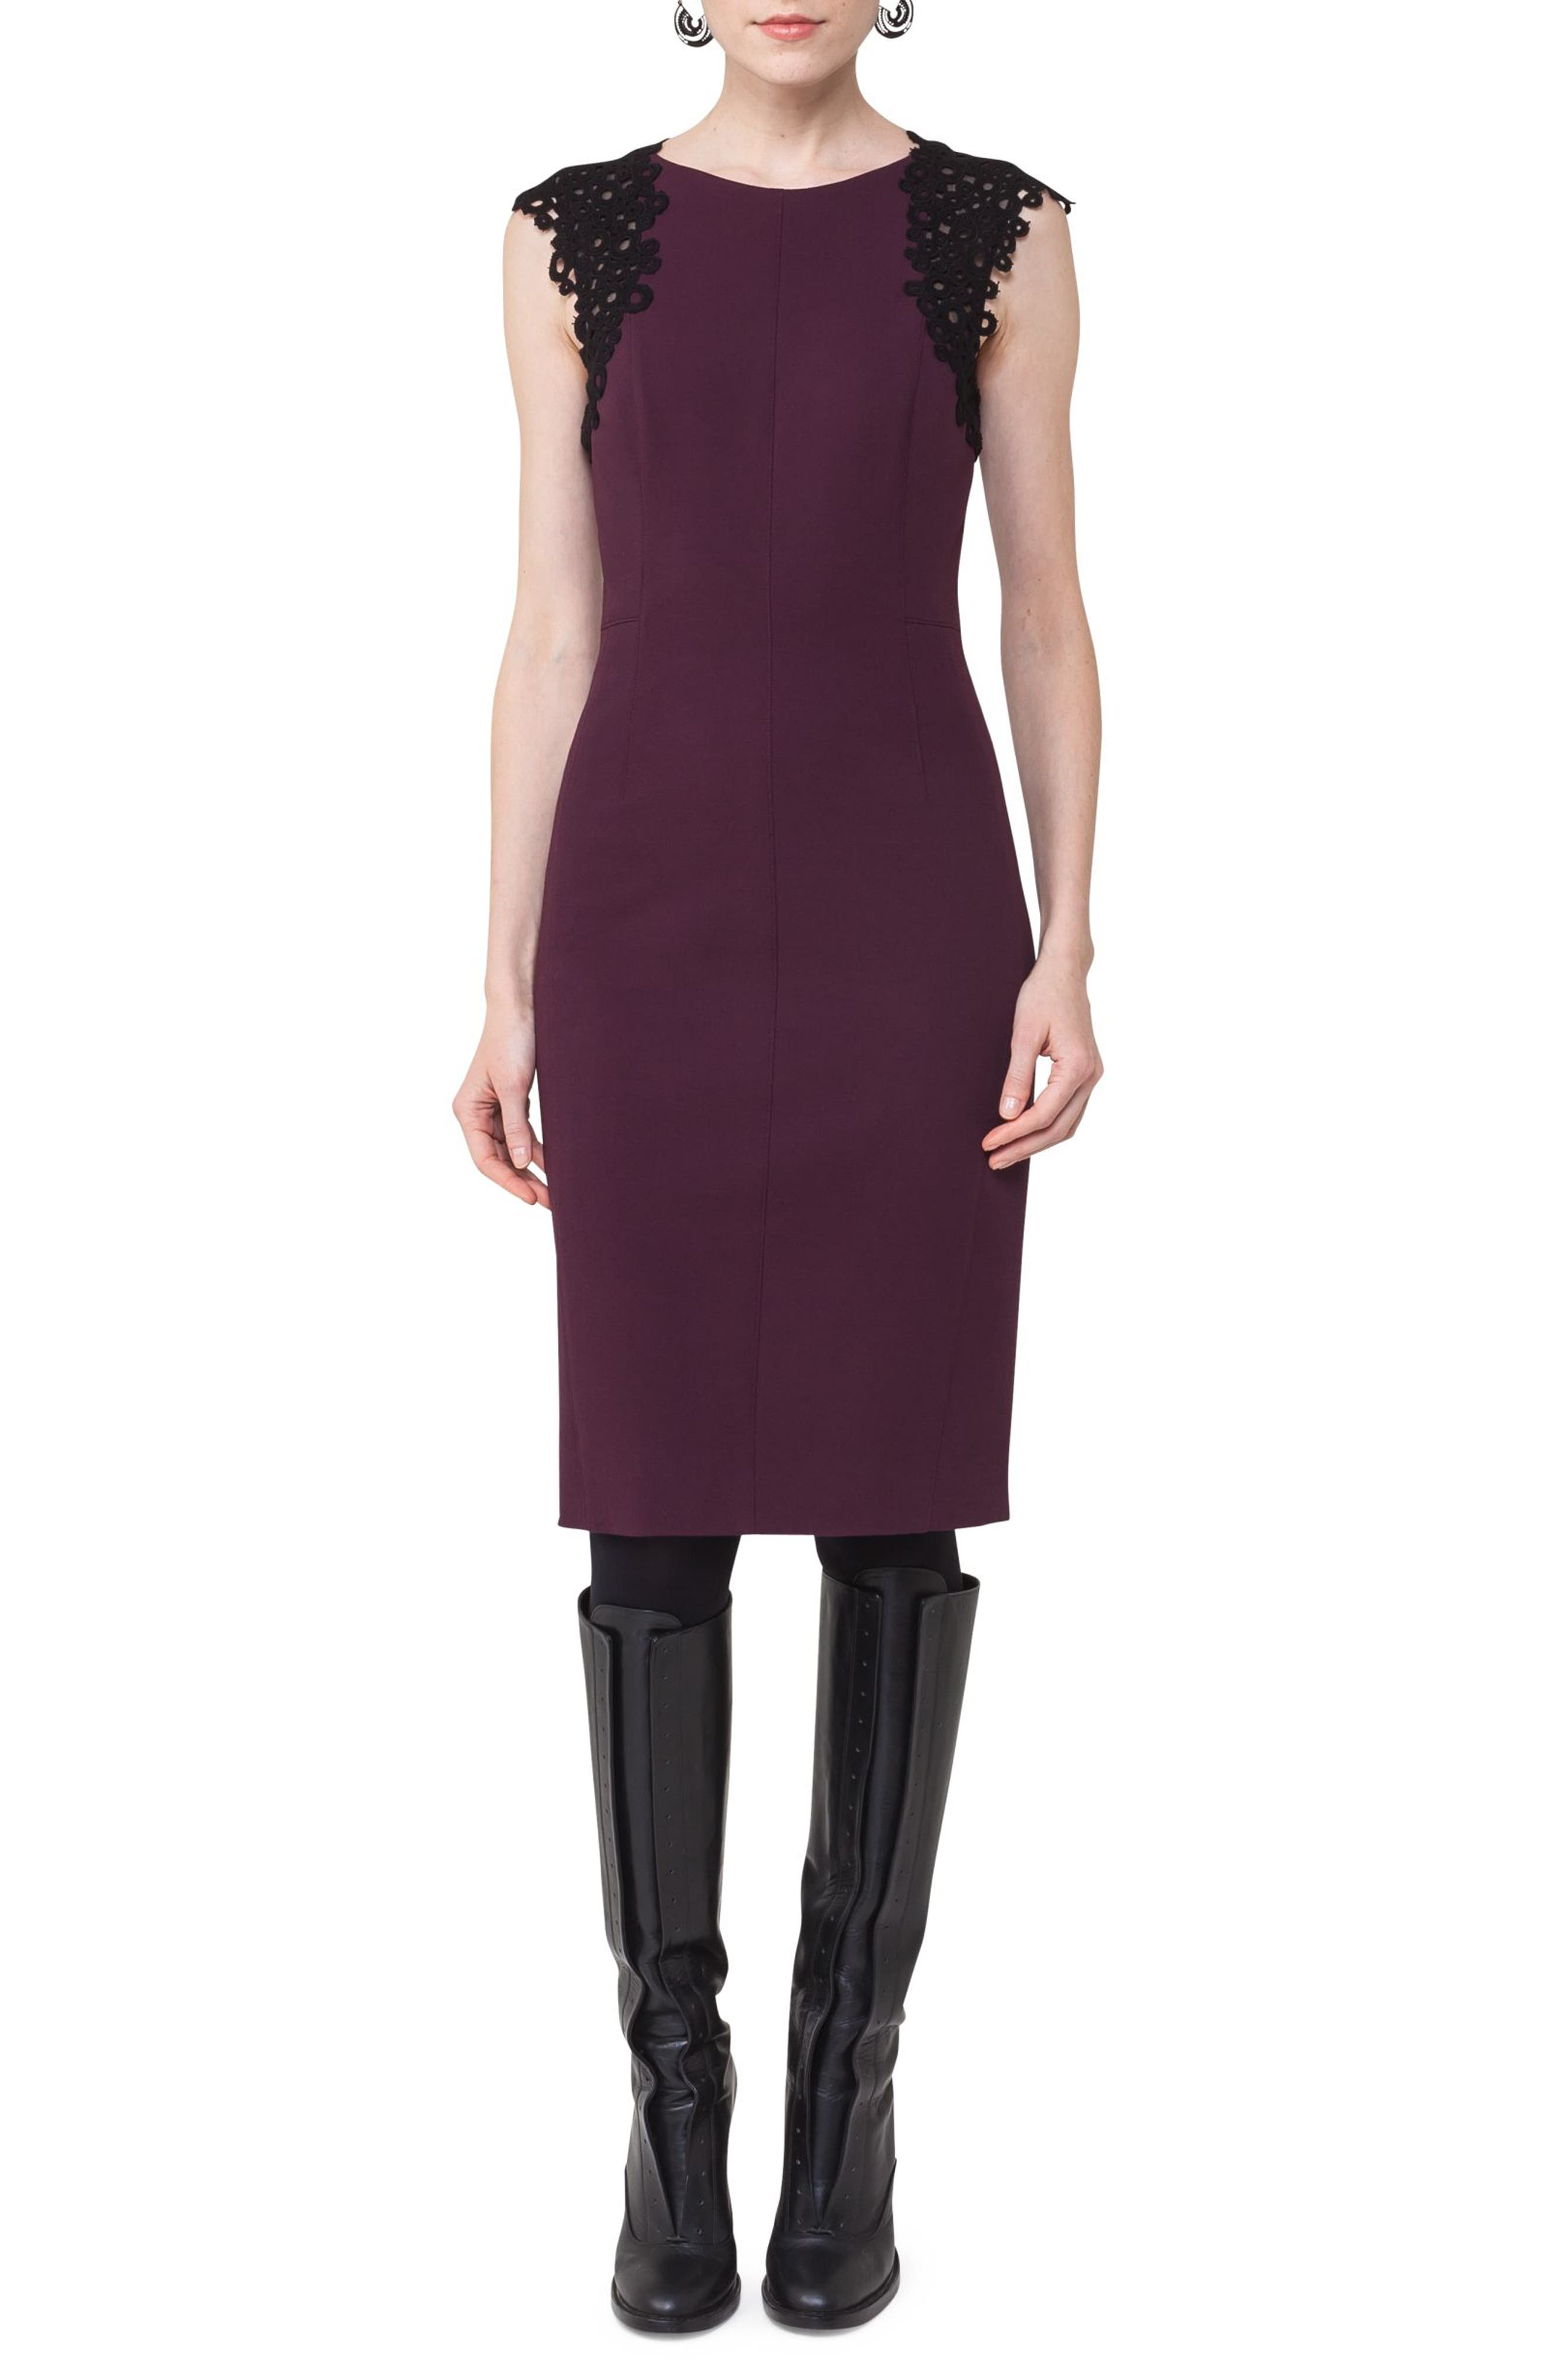 Lace Trim Sheath Dress,                             Main thumbnail 1, color,                             930